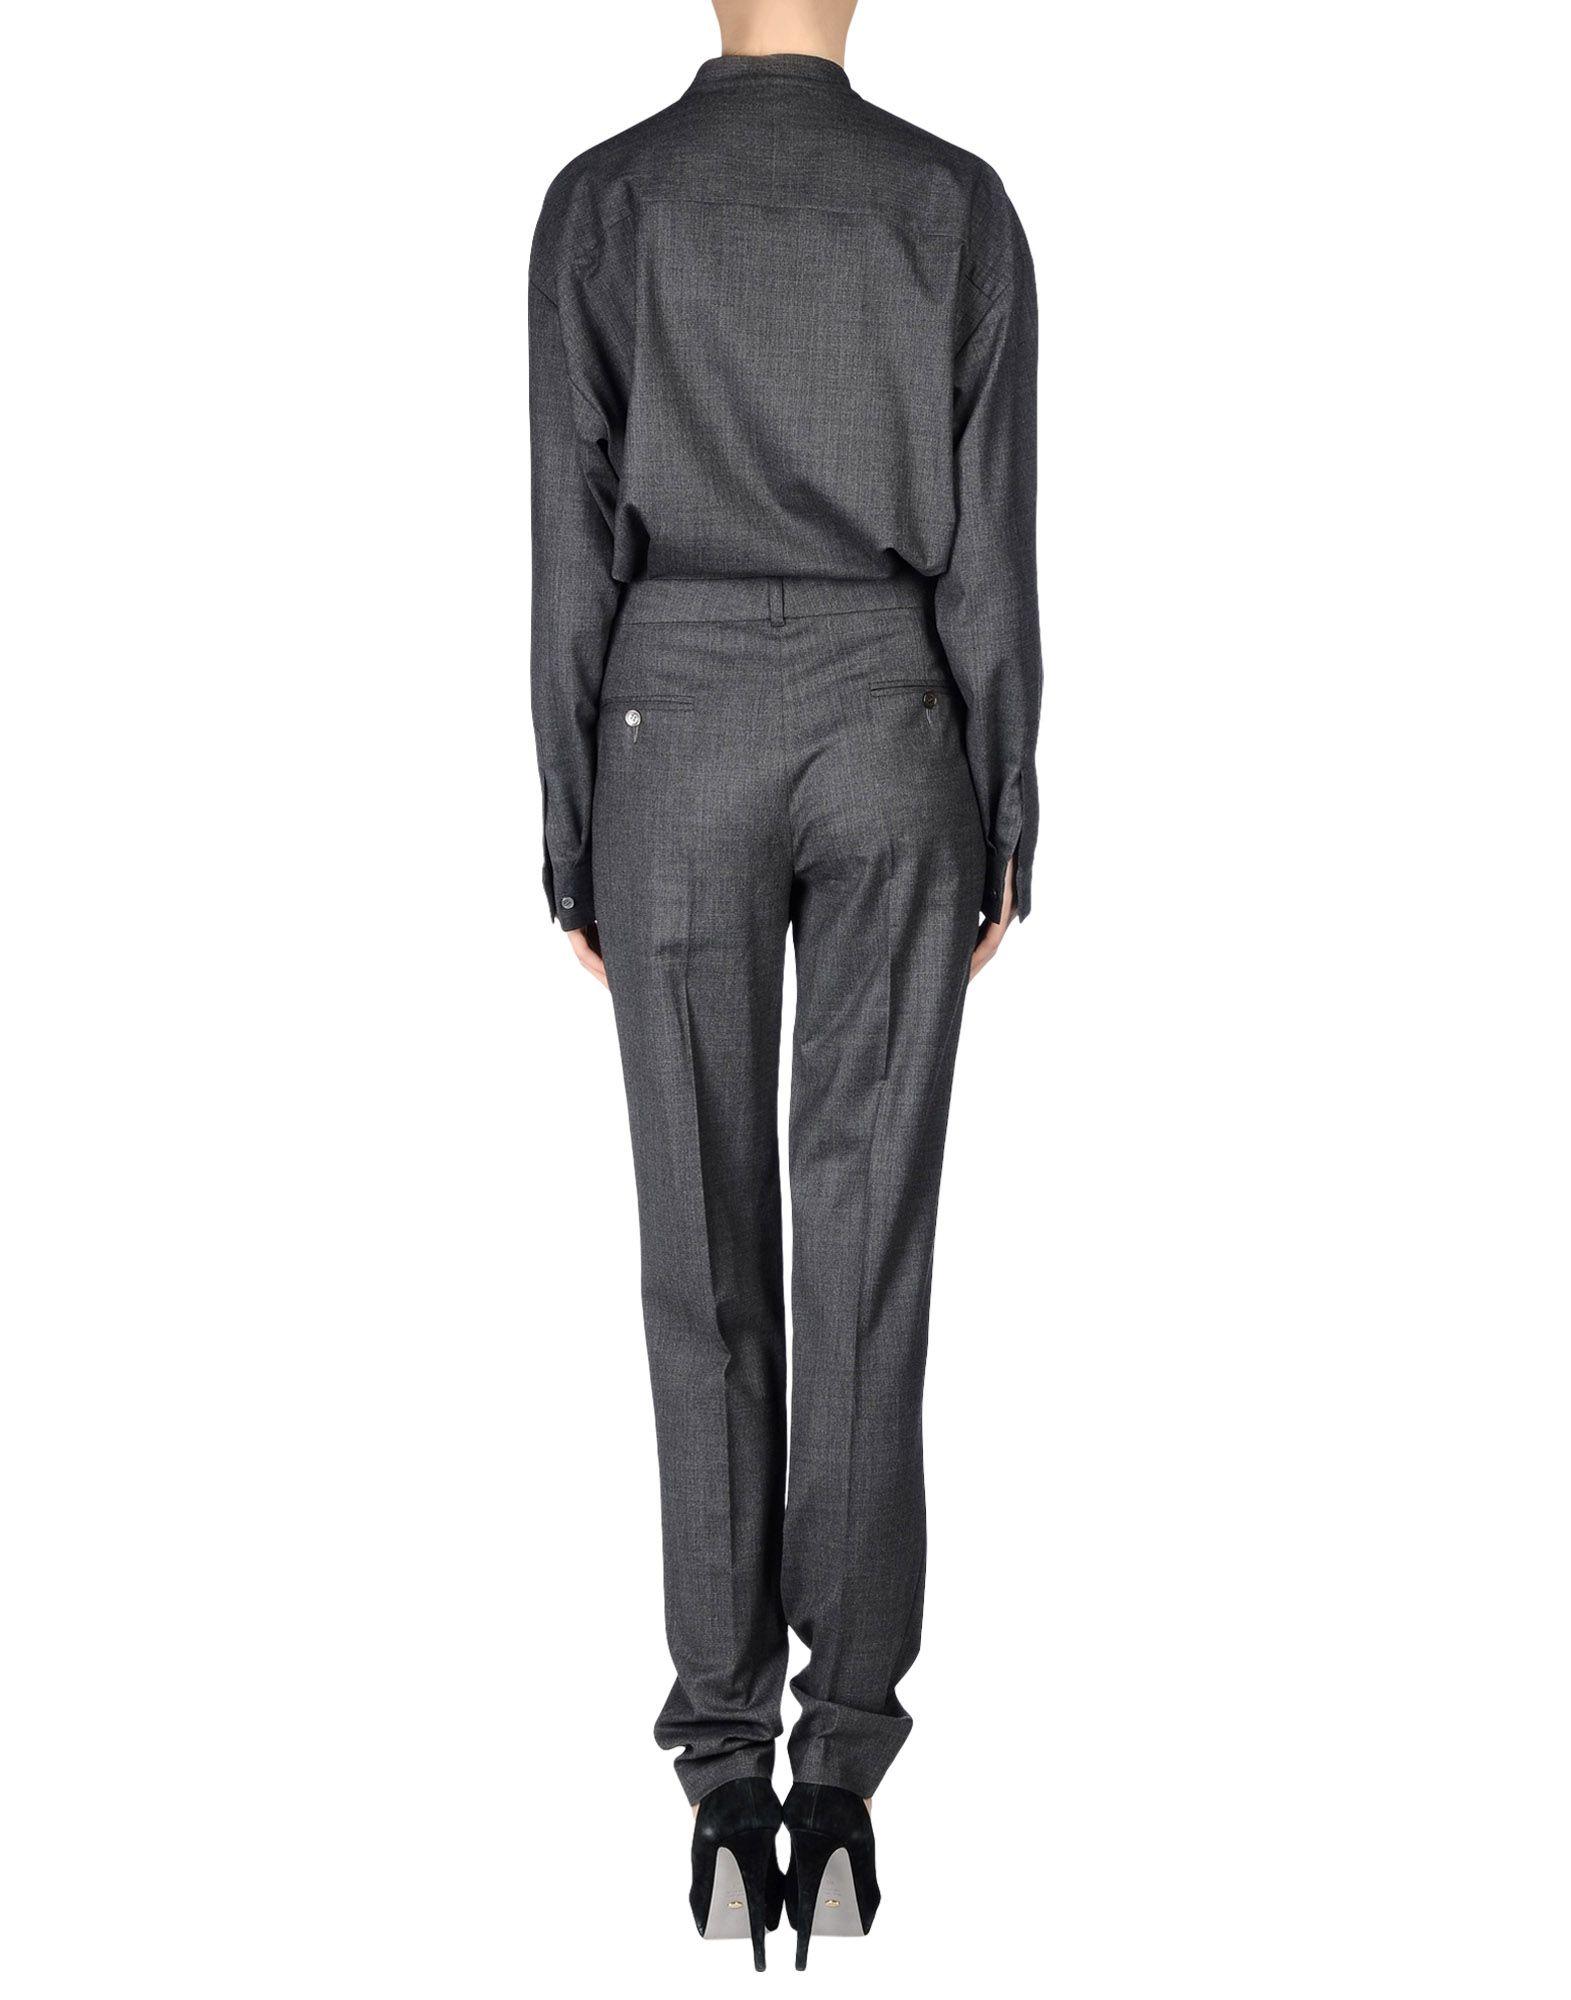 michael kors trouser dungaree in gray lyst. Black Bedroom Furniture Sets. Home Design Ideas